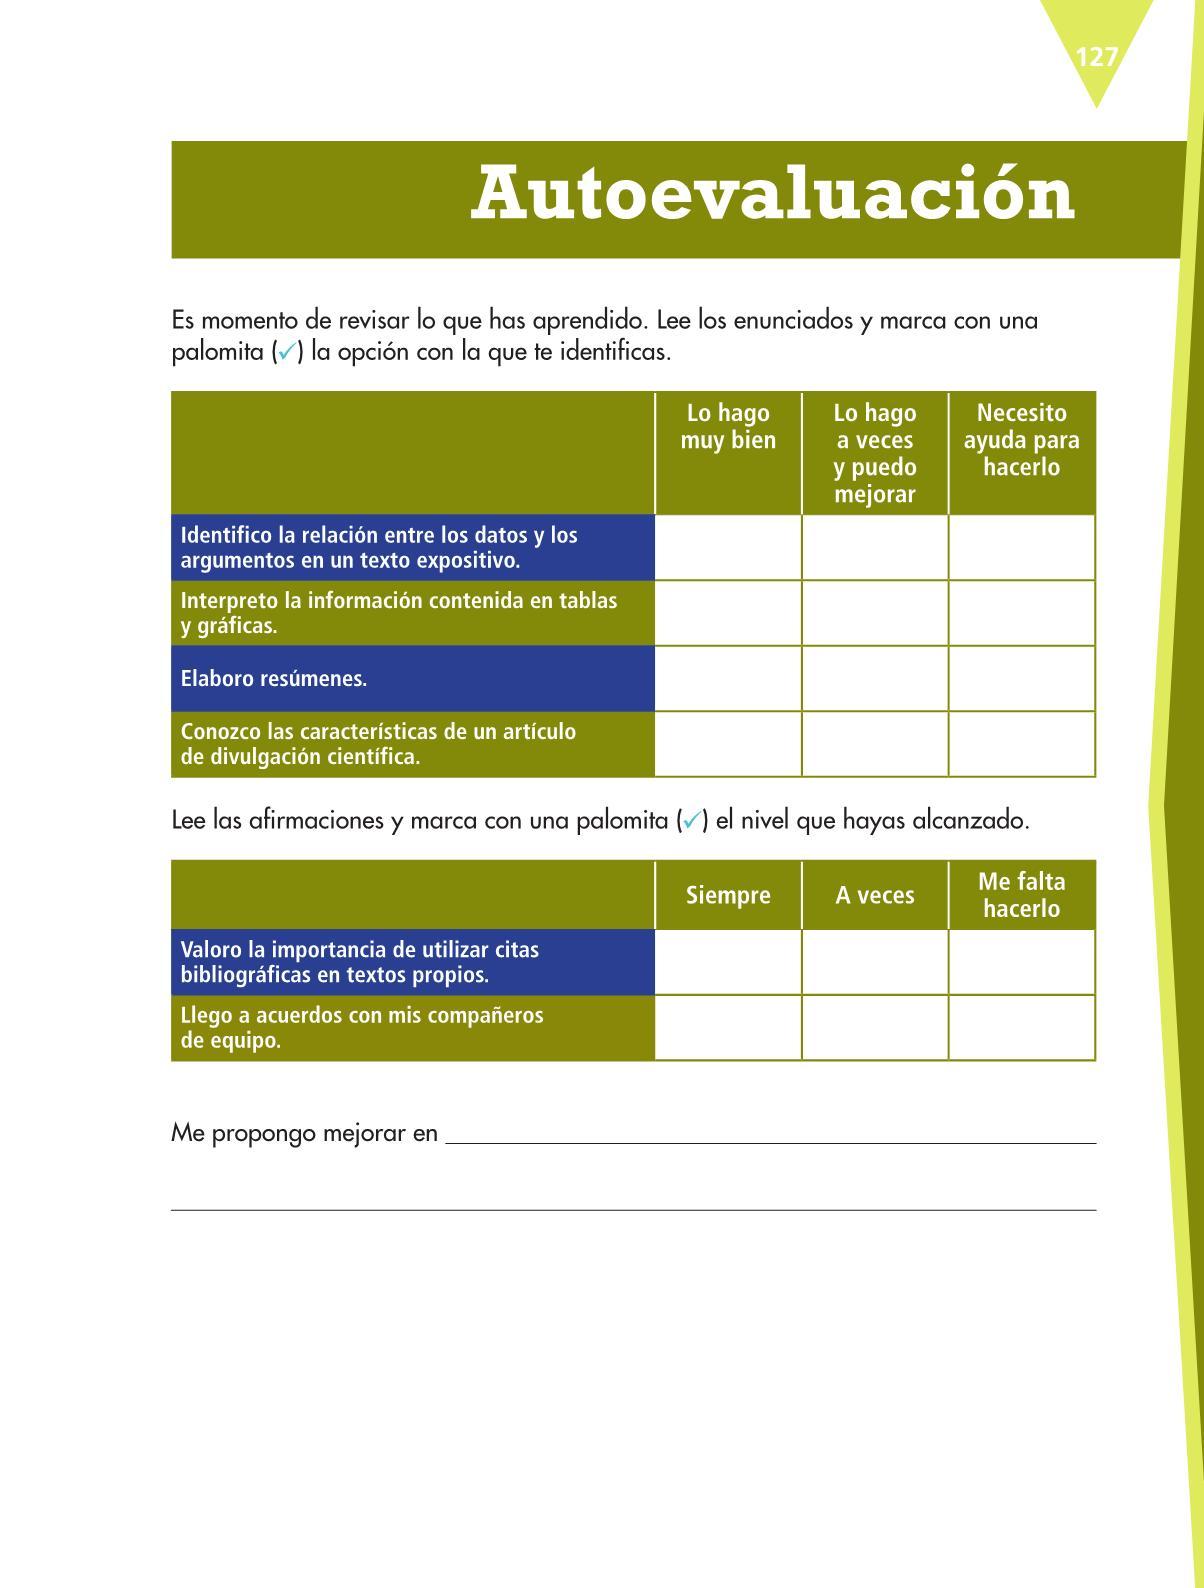 Español Libro para el alumnoquintoPagina 127